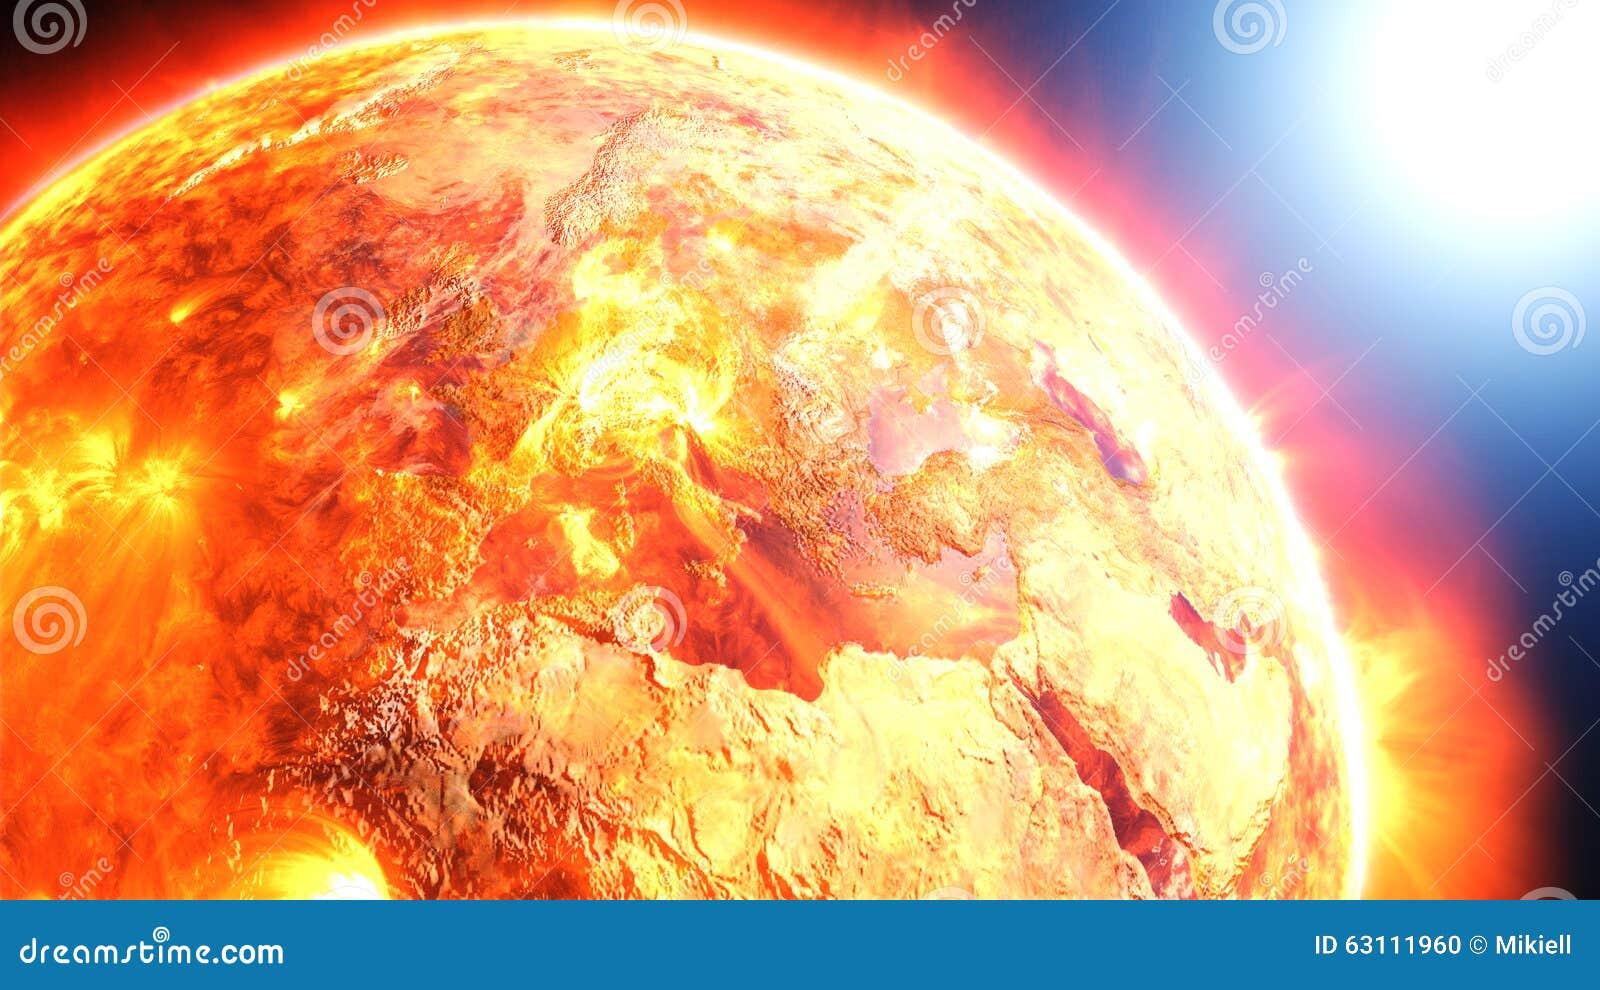 Stock Illustration Earth Burning Exploding Global Disaster Apocalyptic Scenario Elements D Rendered Image Furnished Nasa Image63111960on Asteroid Impact Tsunami